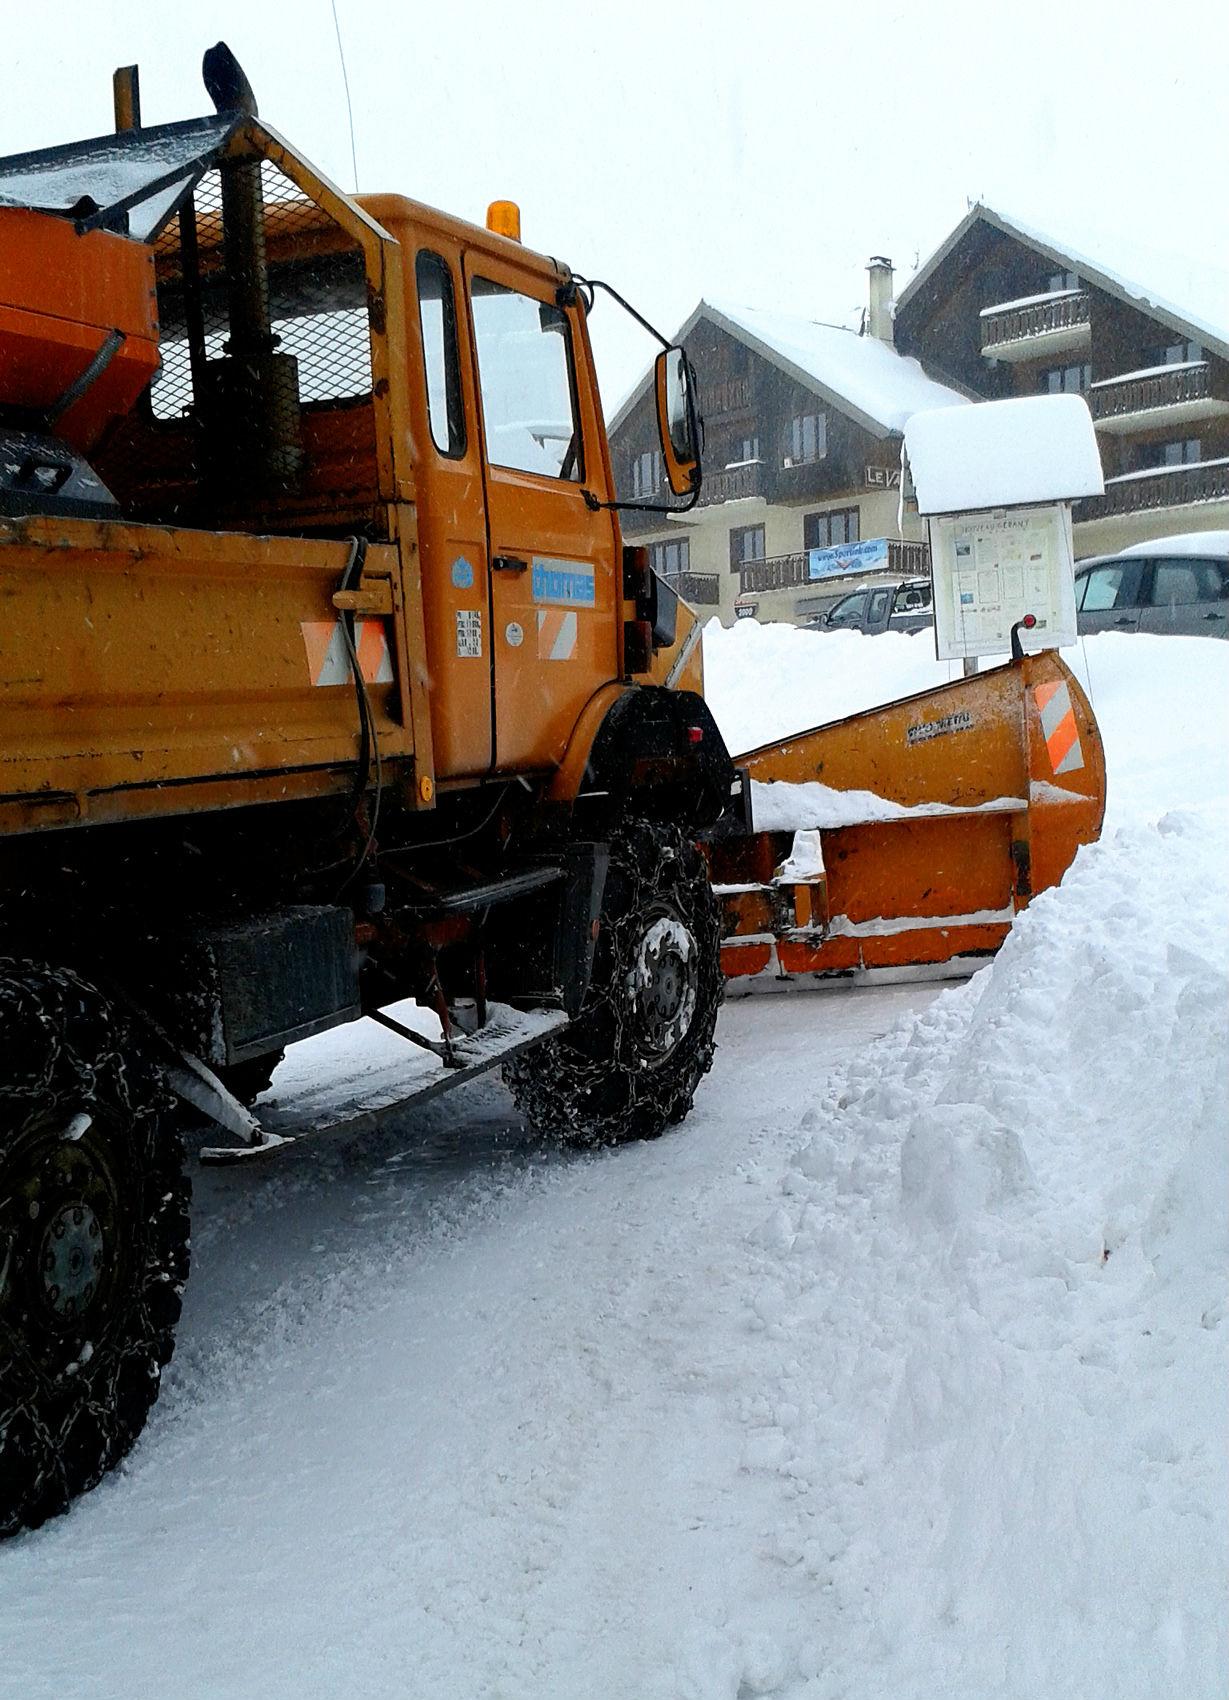 GPS versus snow storms in Canada